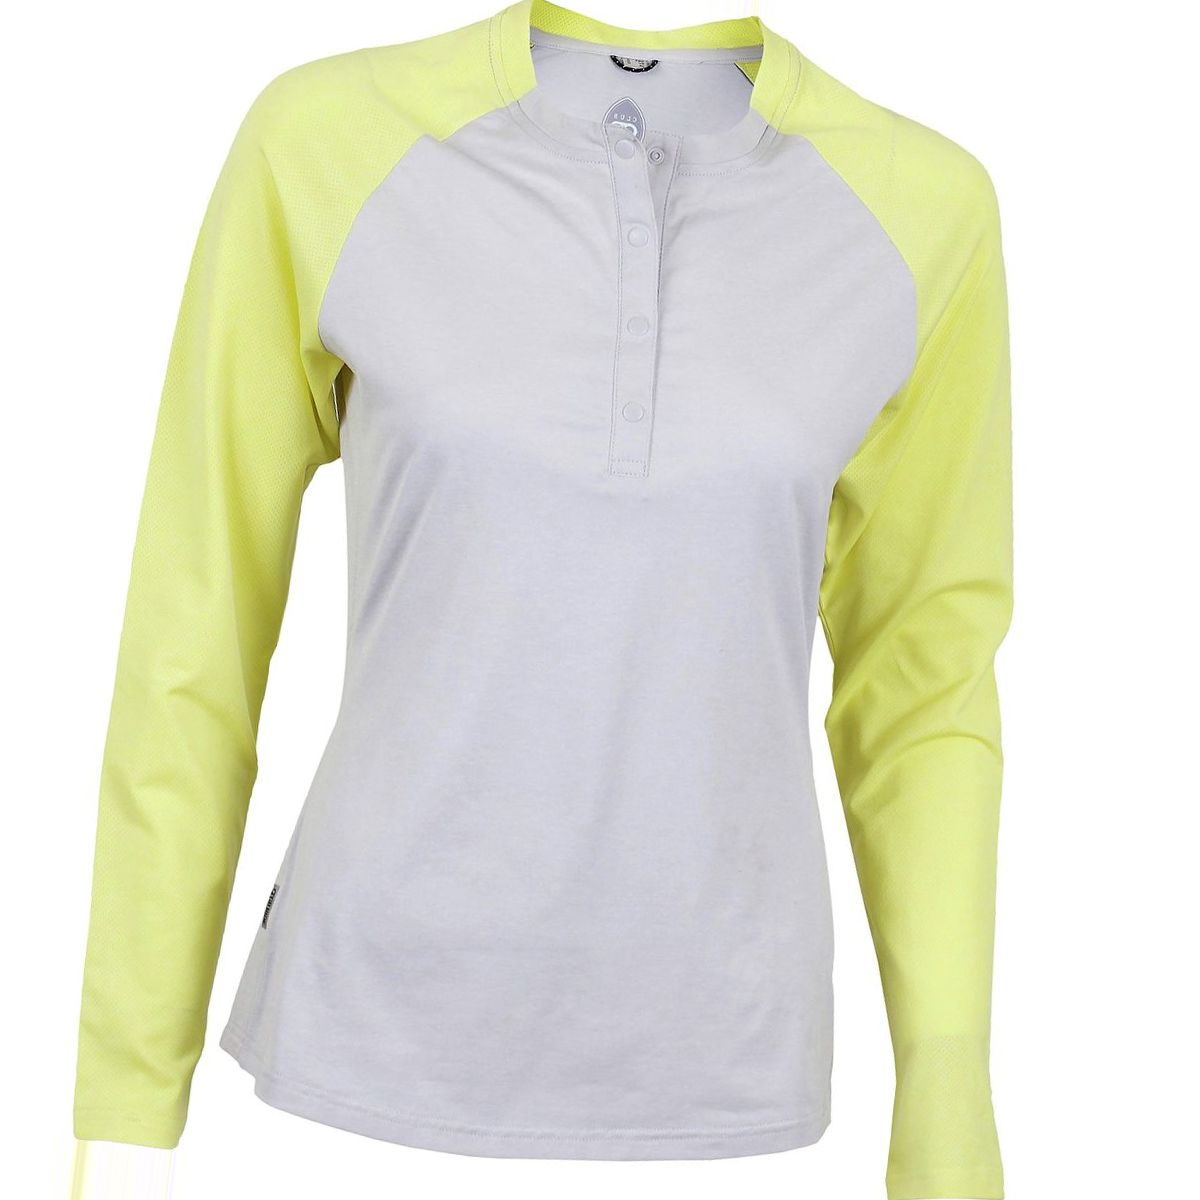 Club Ride Apparel Ida Jersey - Women's